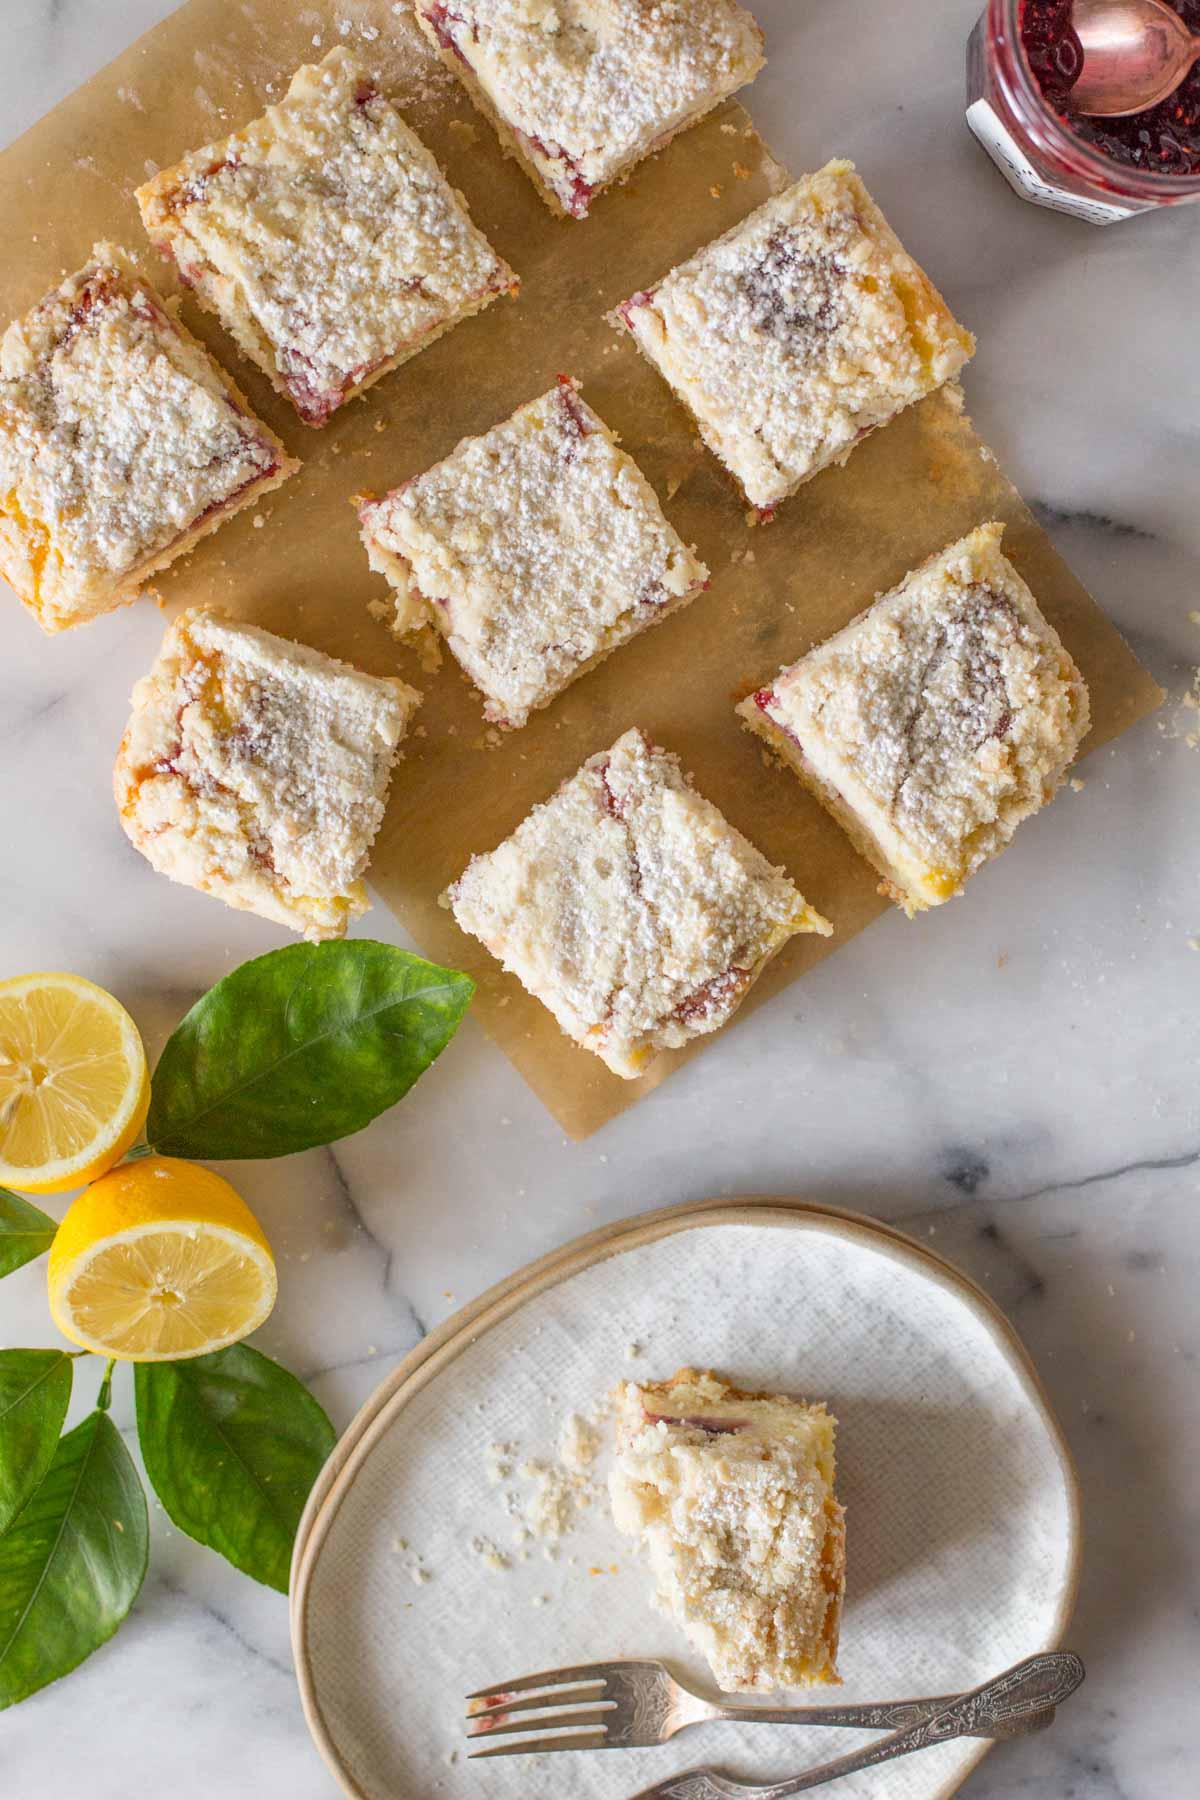 Overhead shot of cut pieces of Lemon Raspberry Cream Cheese Coffee Cake with fresh lemons.